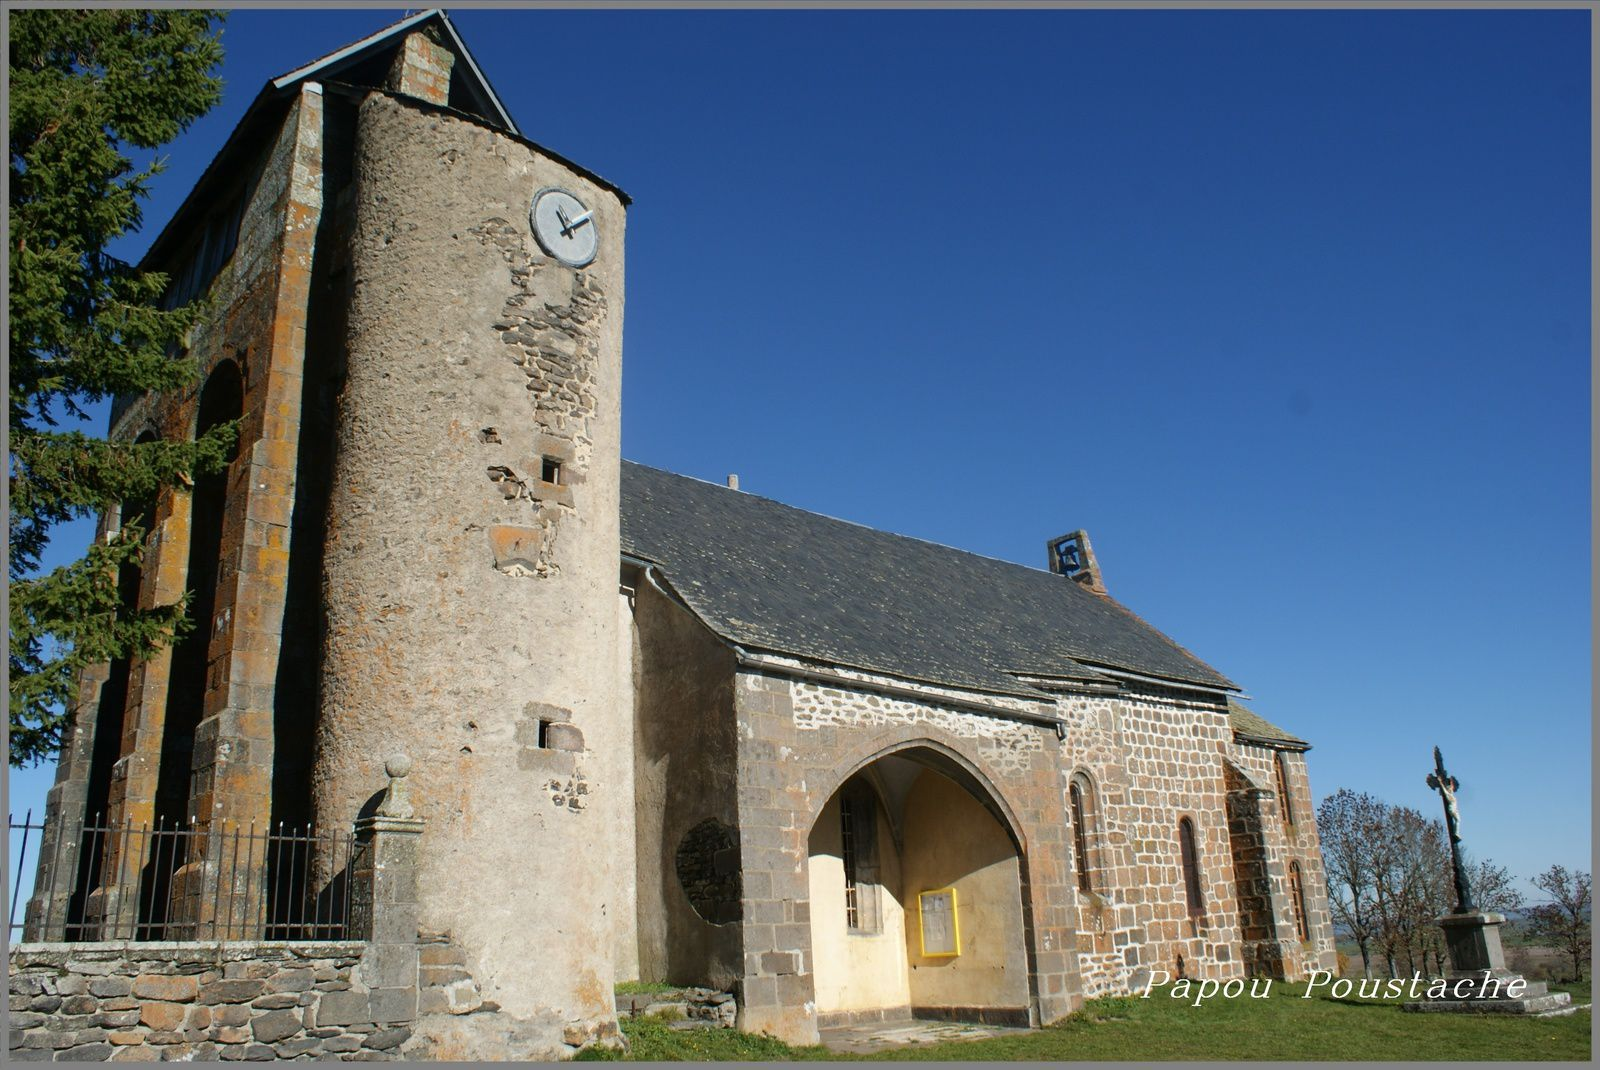 Cussac dans le Cantal